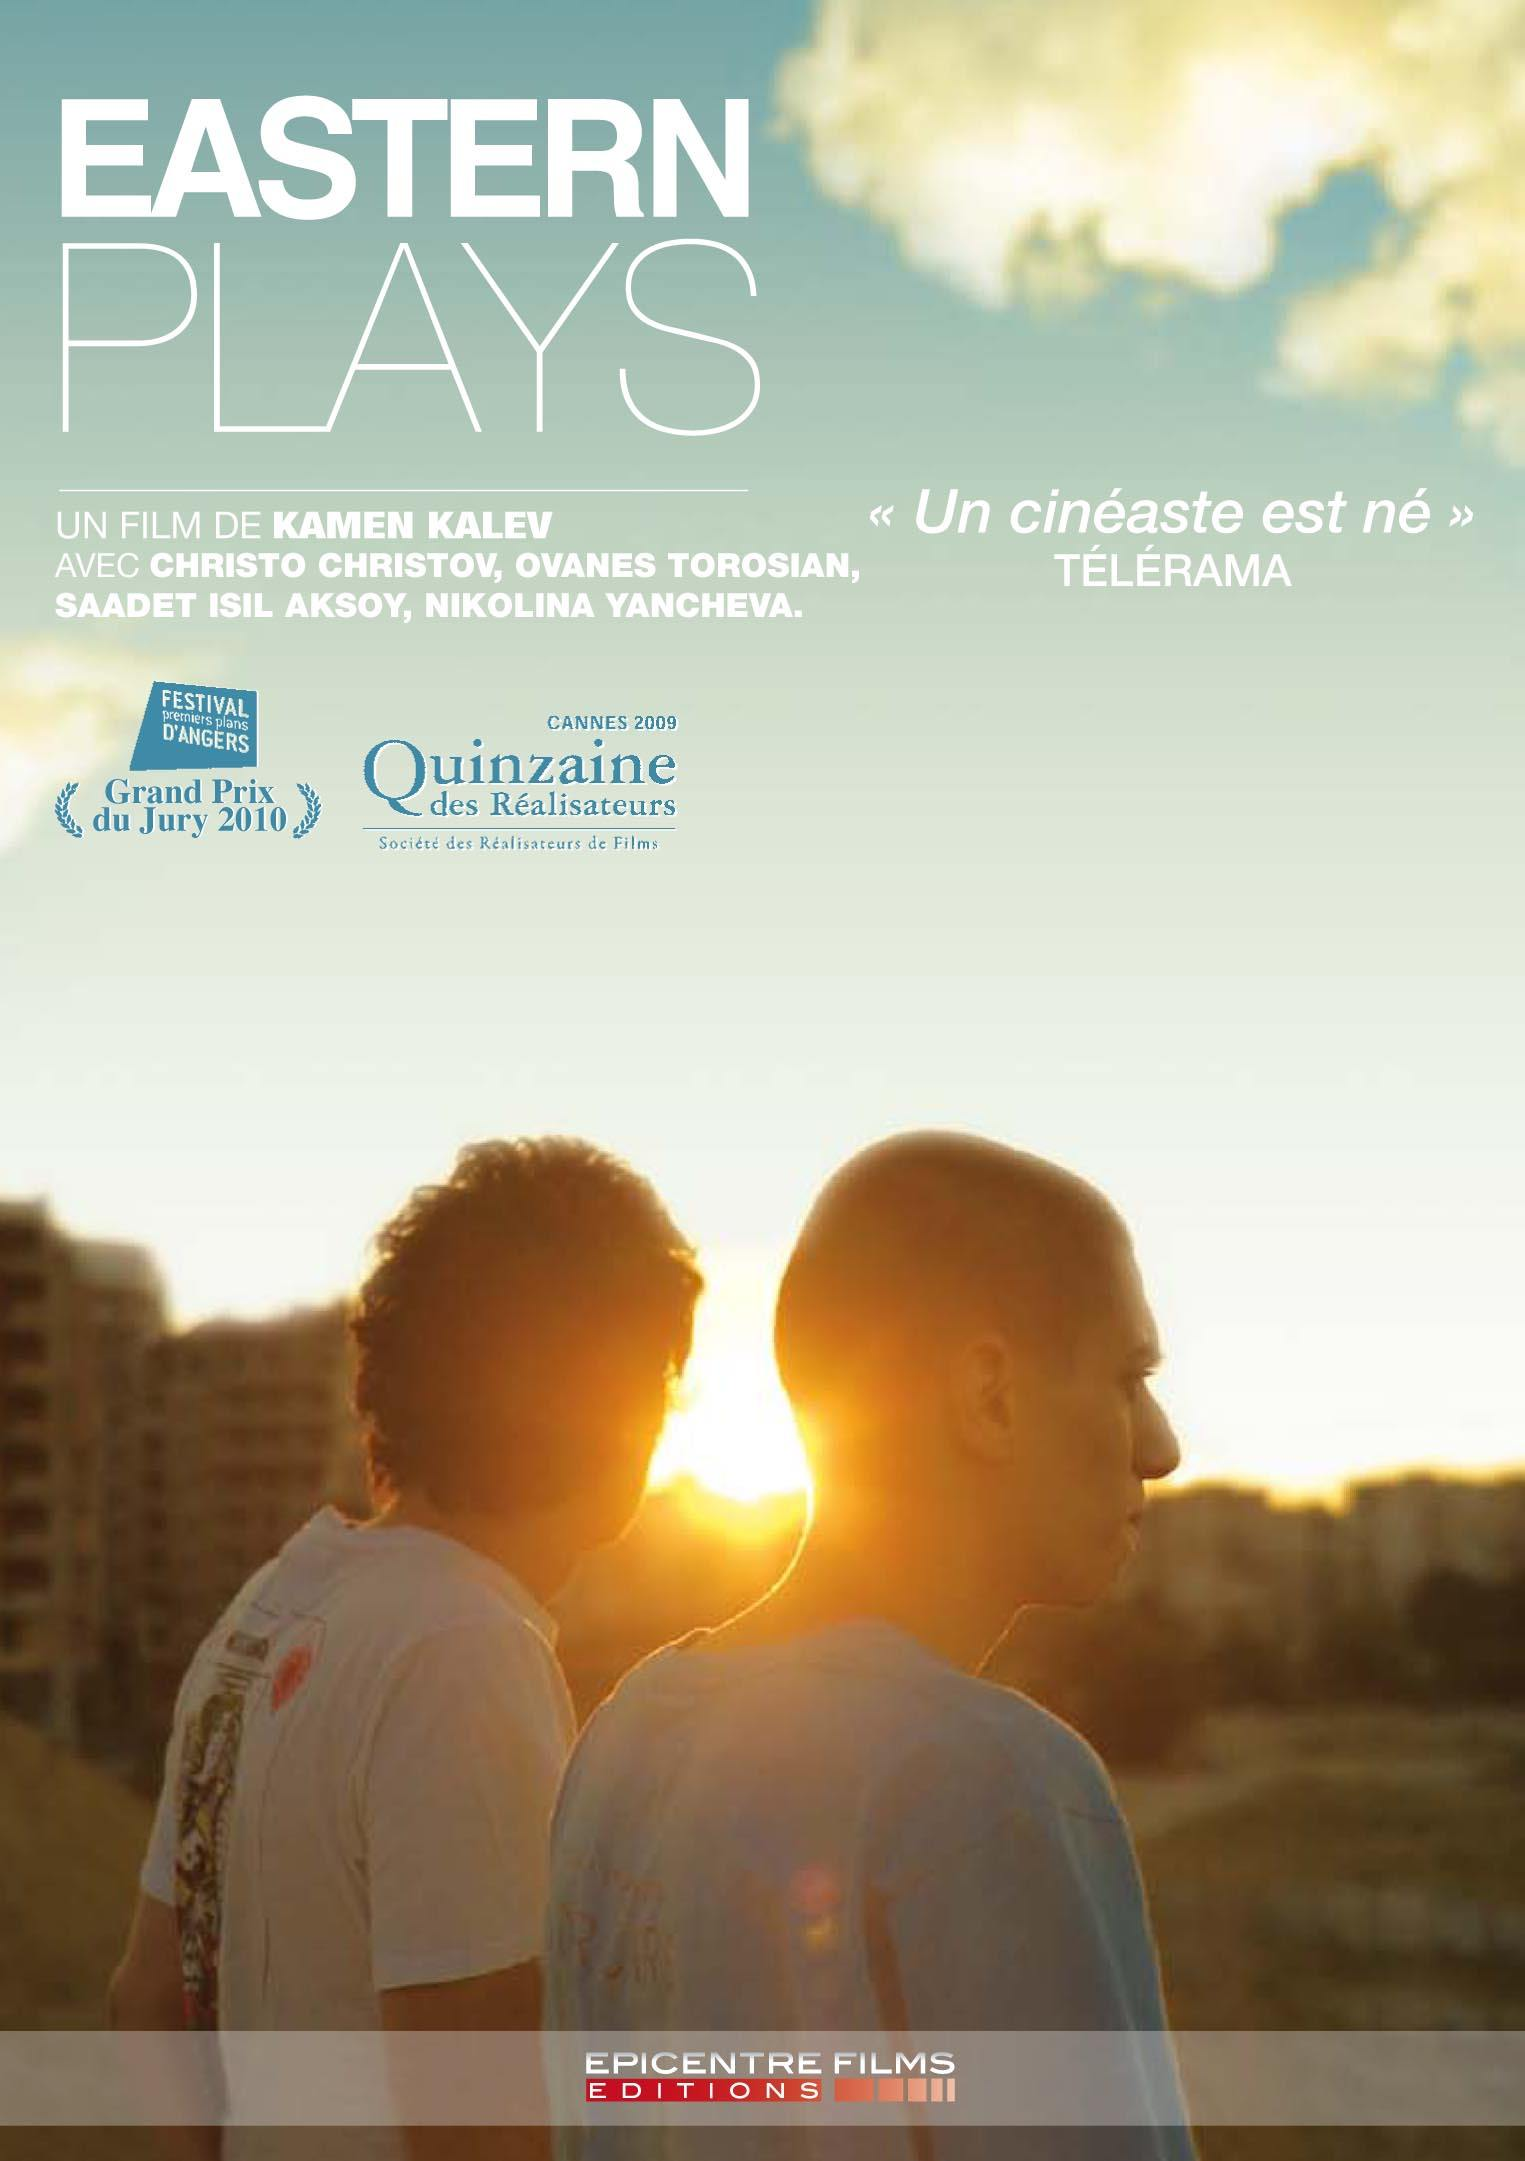 Eastern plays - dvd